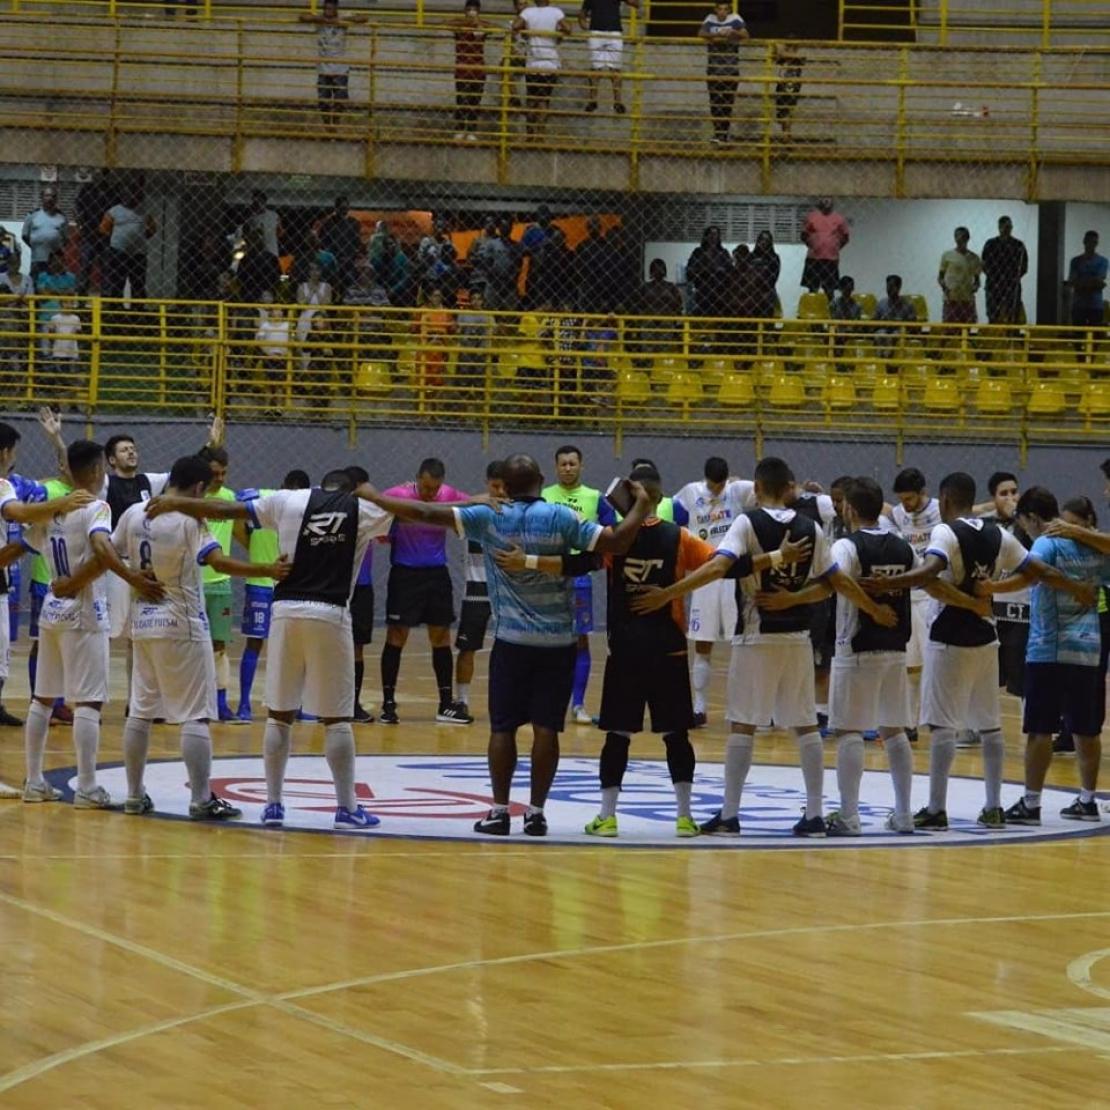 Árbitro morre após passar mal no jogo do Taubaté Futsal